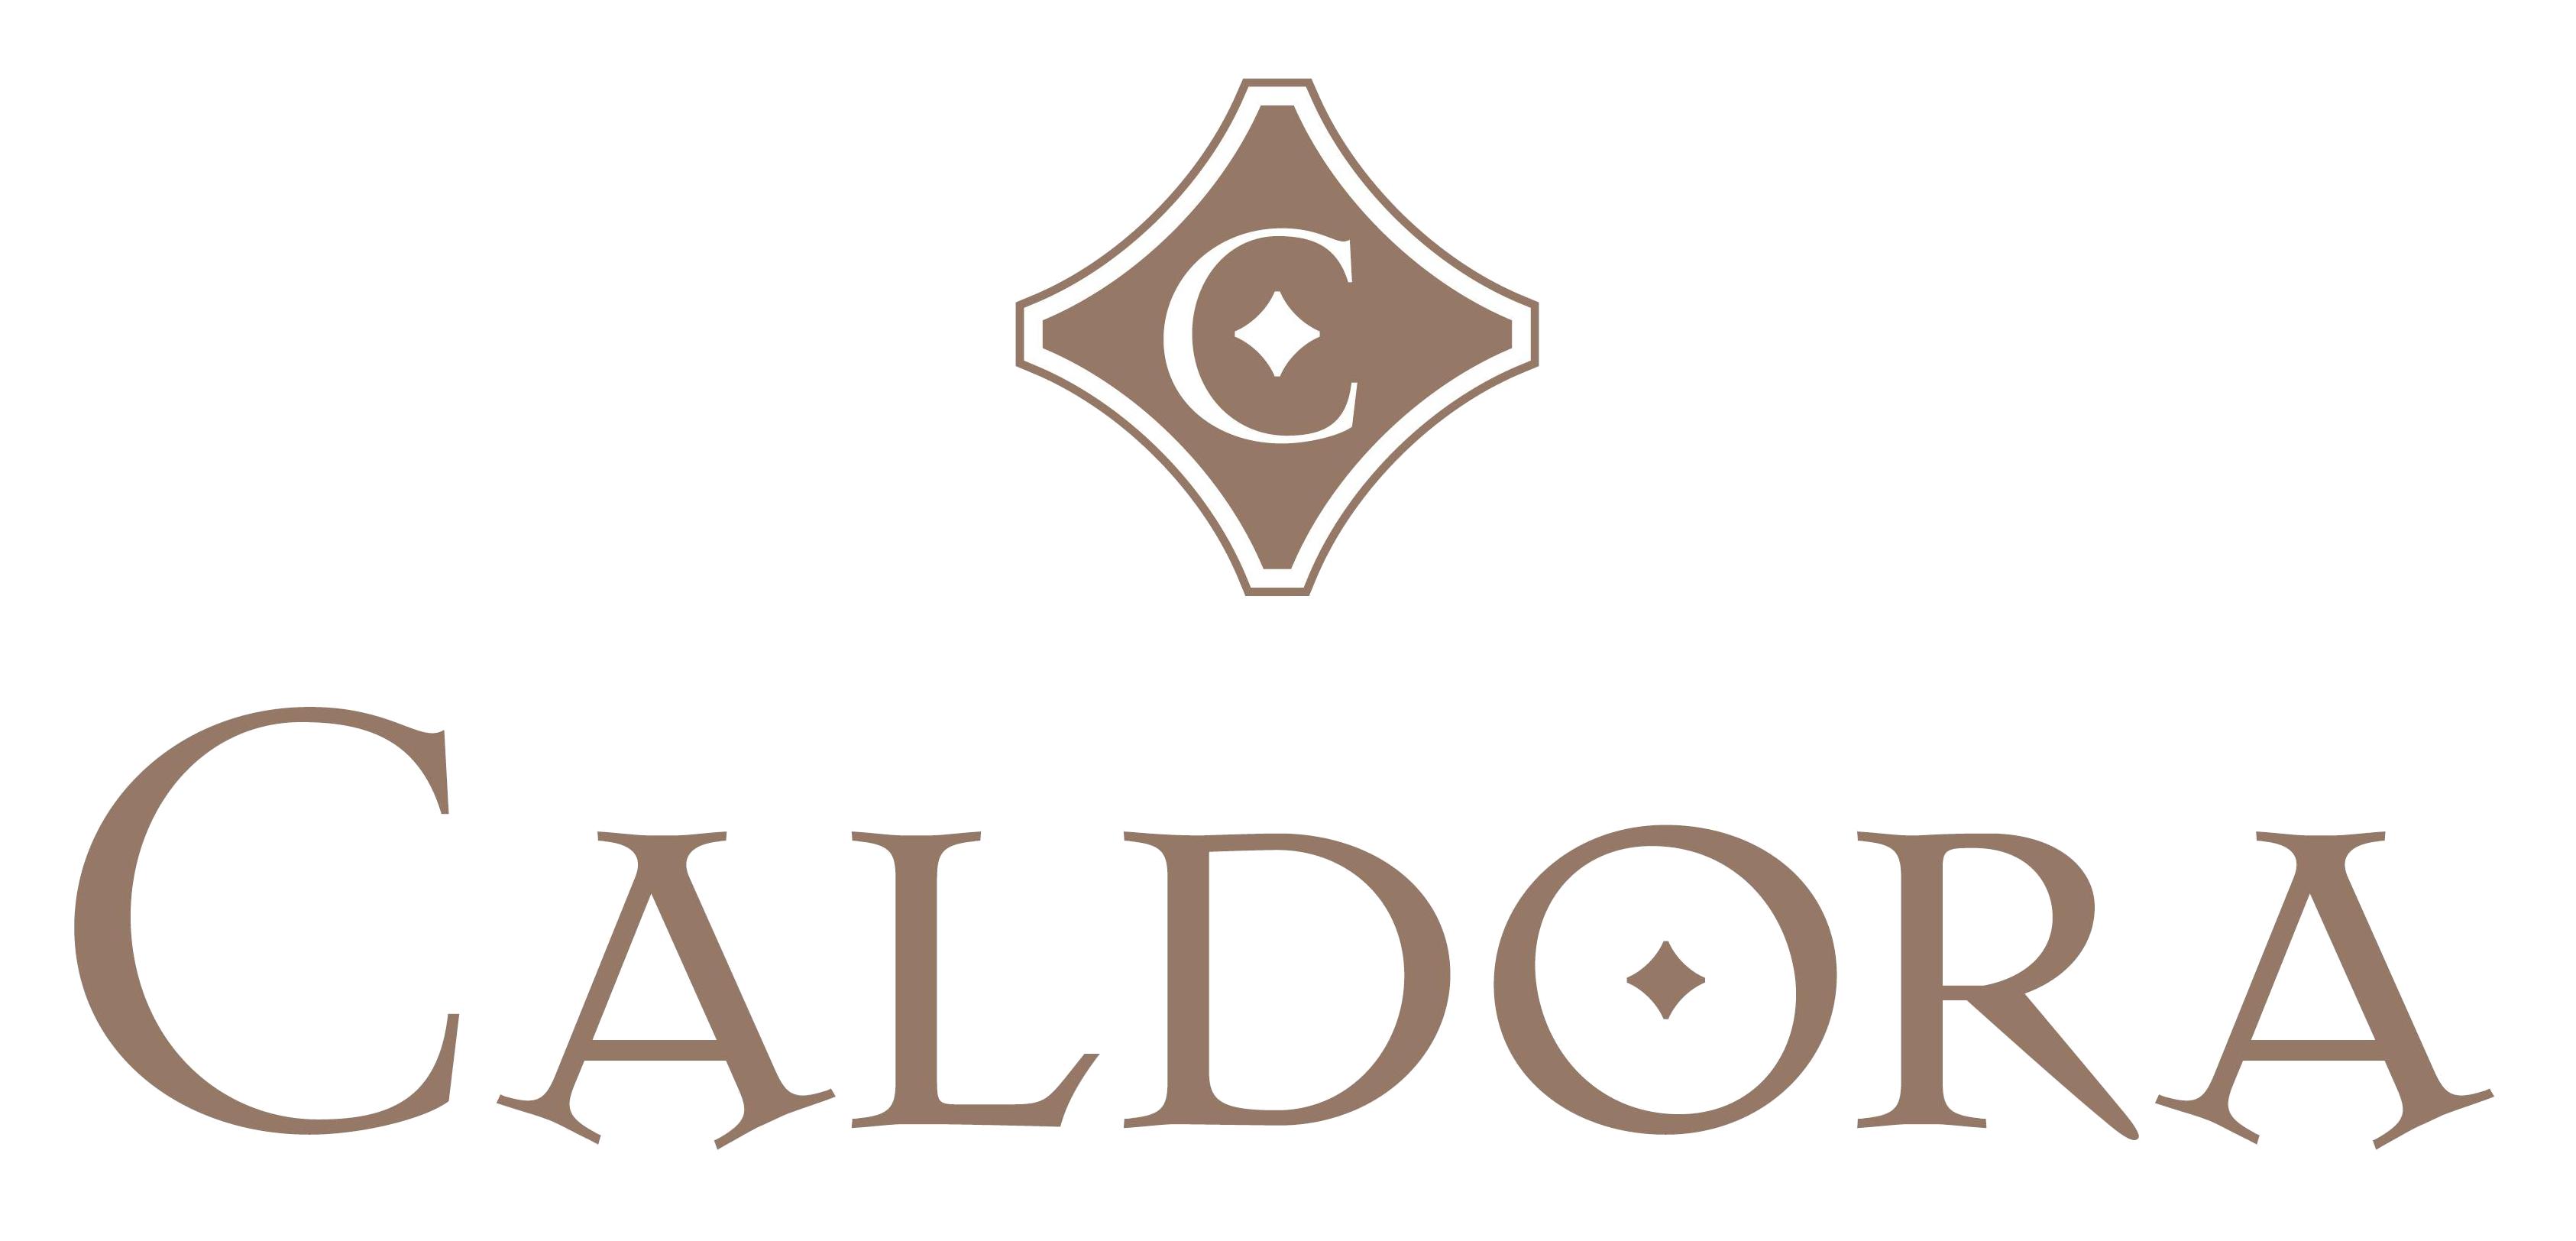 Caldora_logo